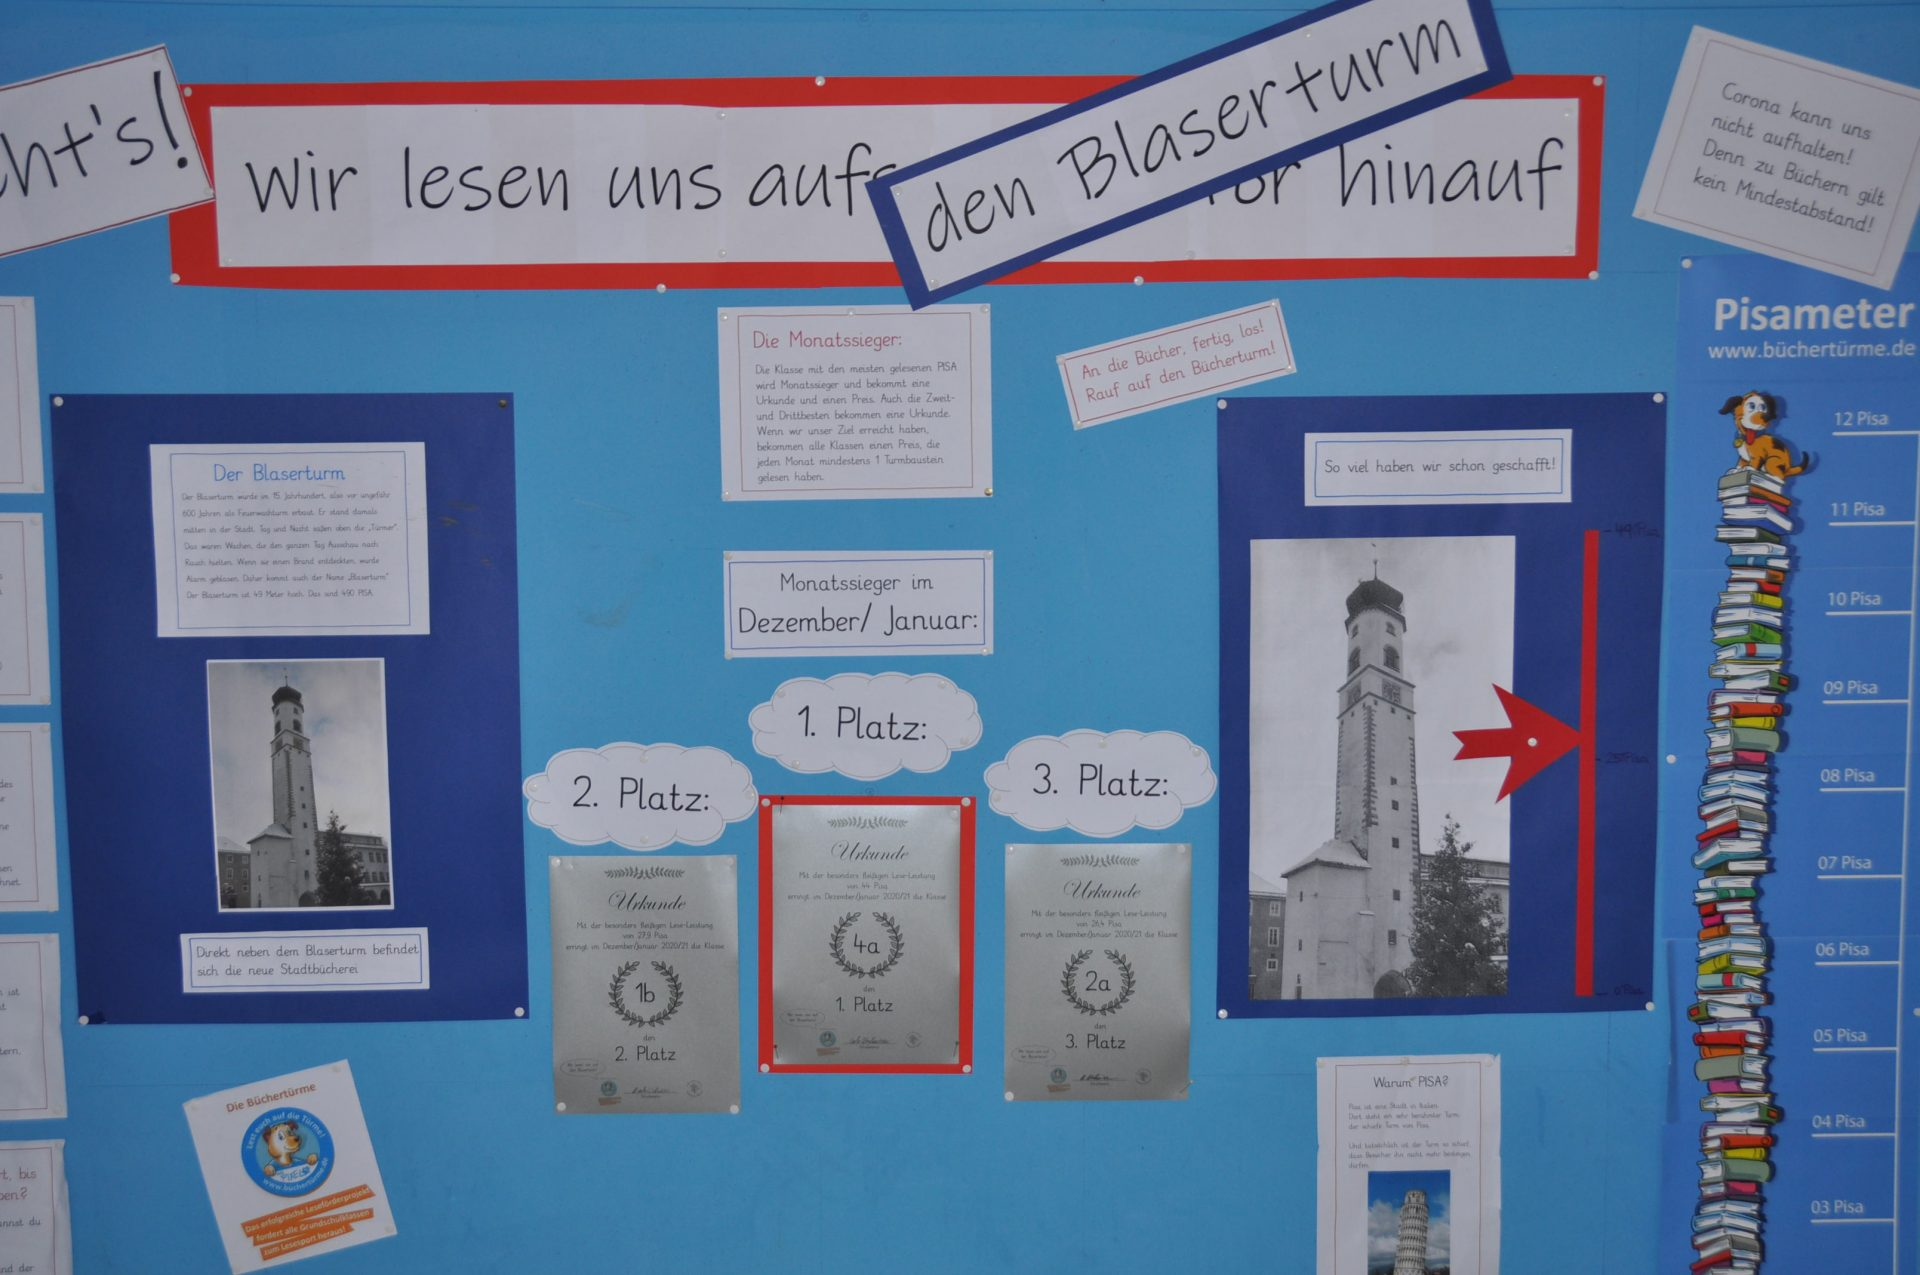 Bücherturm-Projekt: Unsere Monatssieger